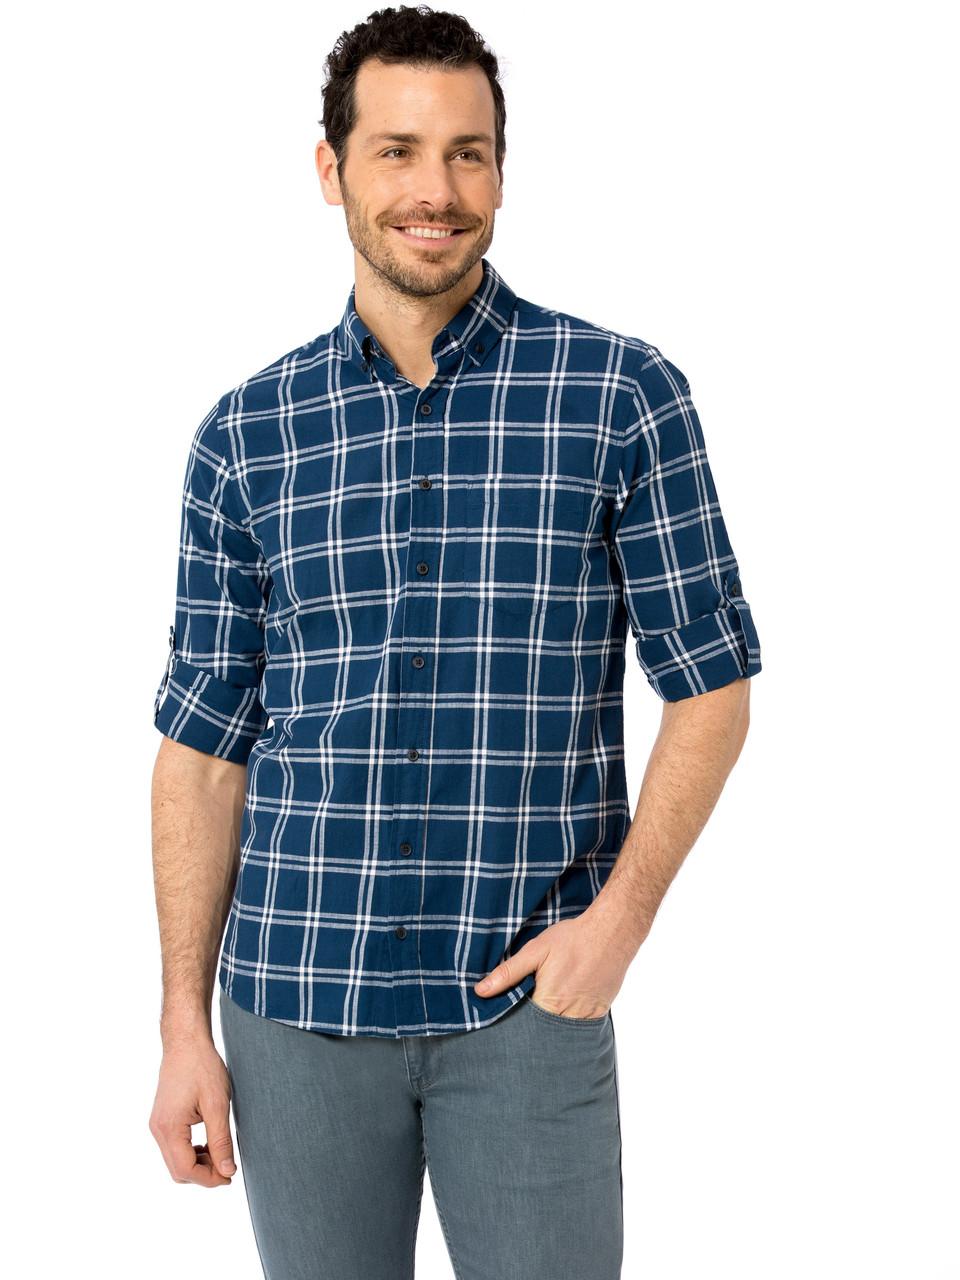 Синяя мужская рубашка LC Waikiki / ЛС Вайкики в крупную белую клетку, с карманом на груди